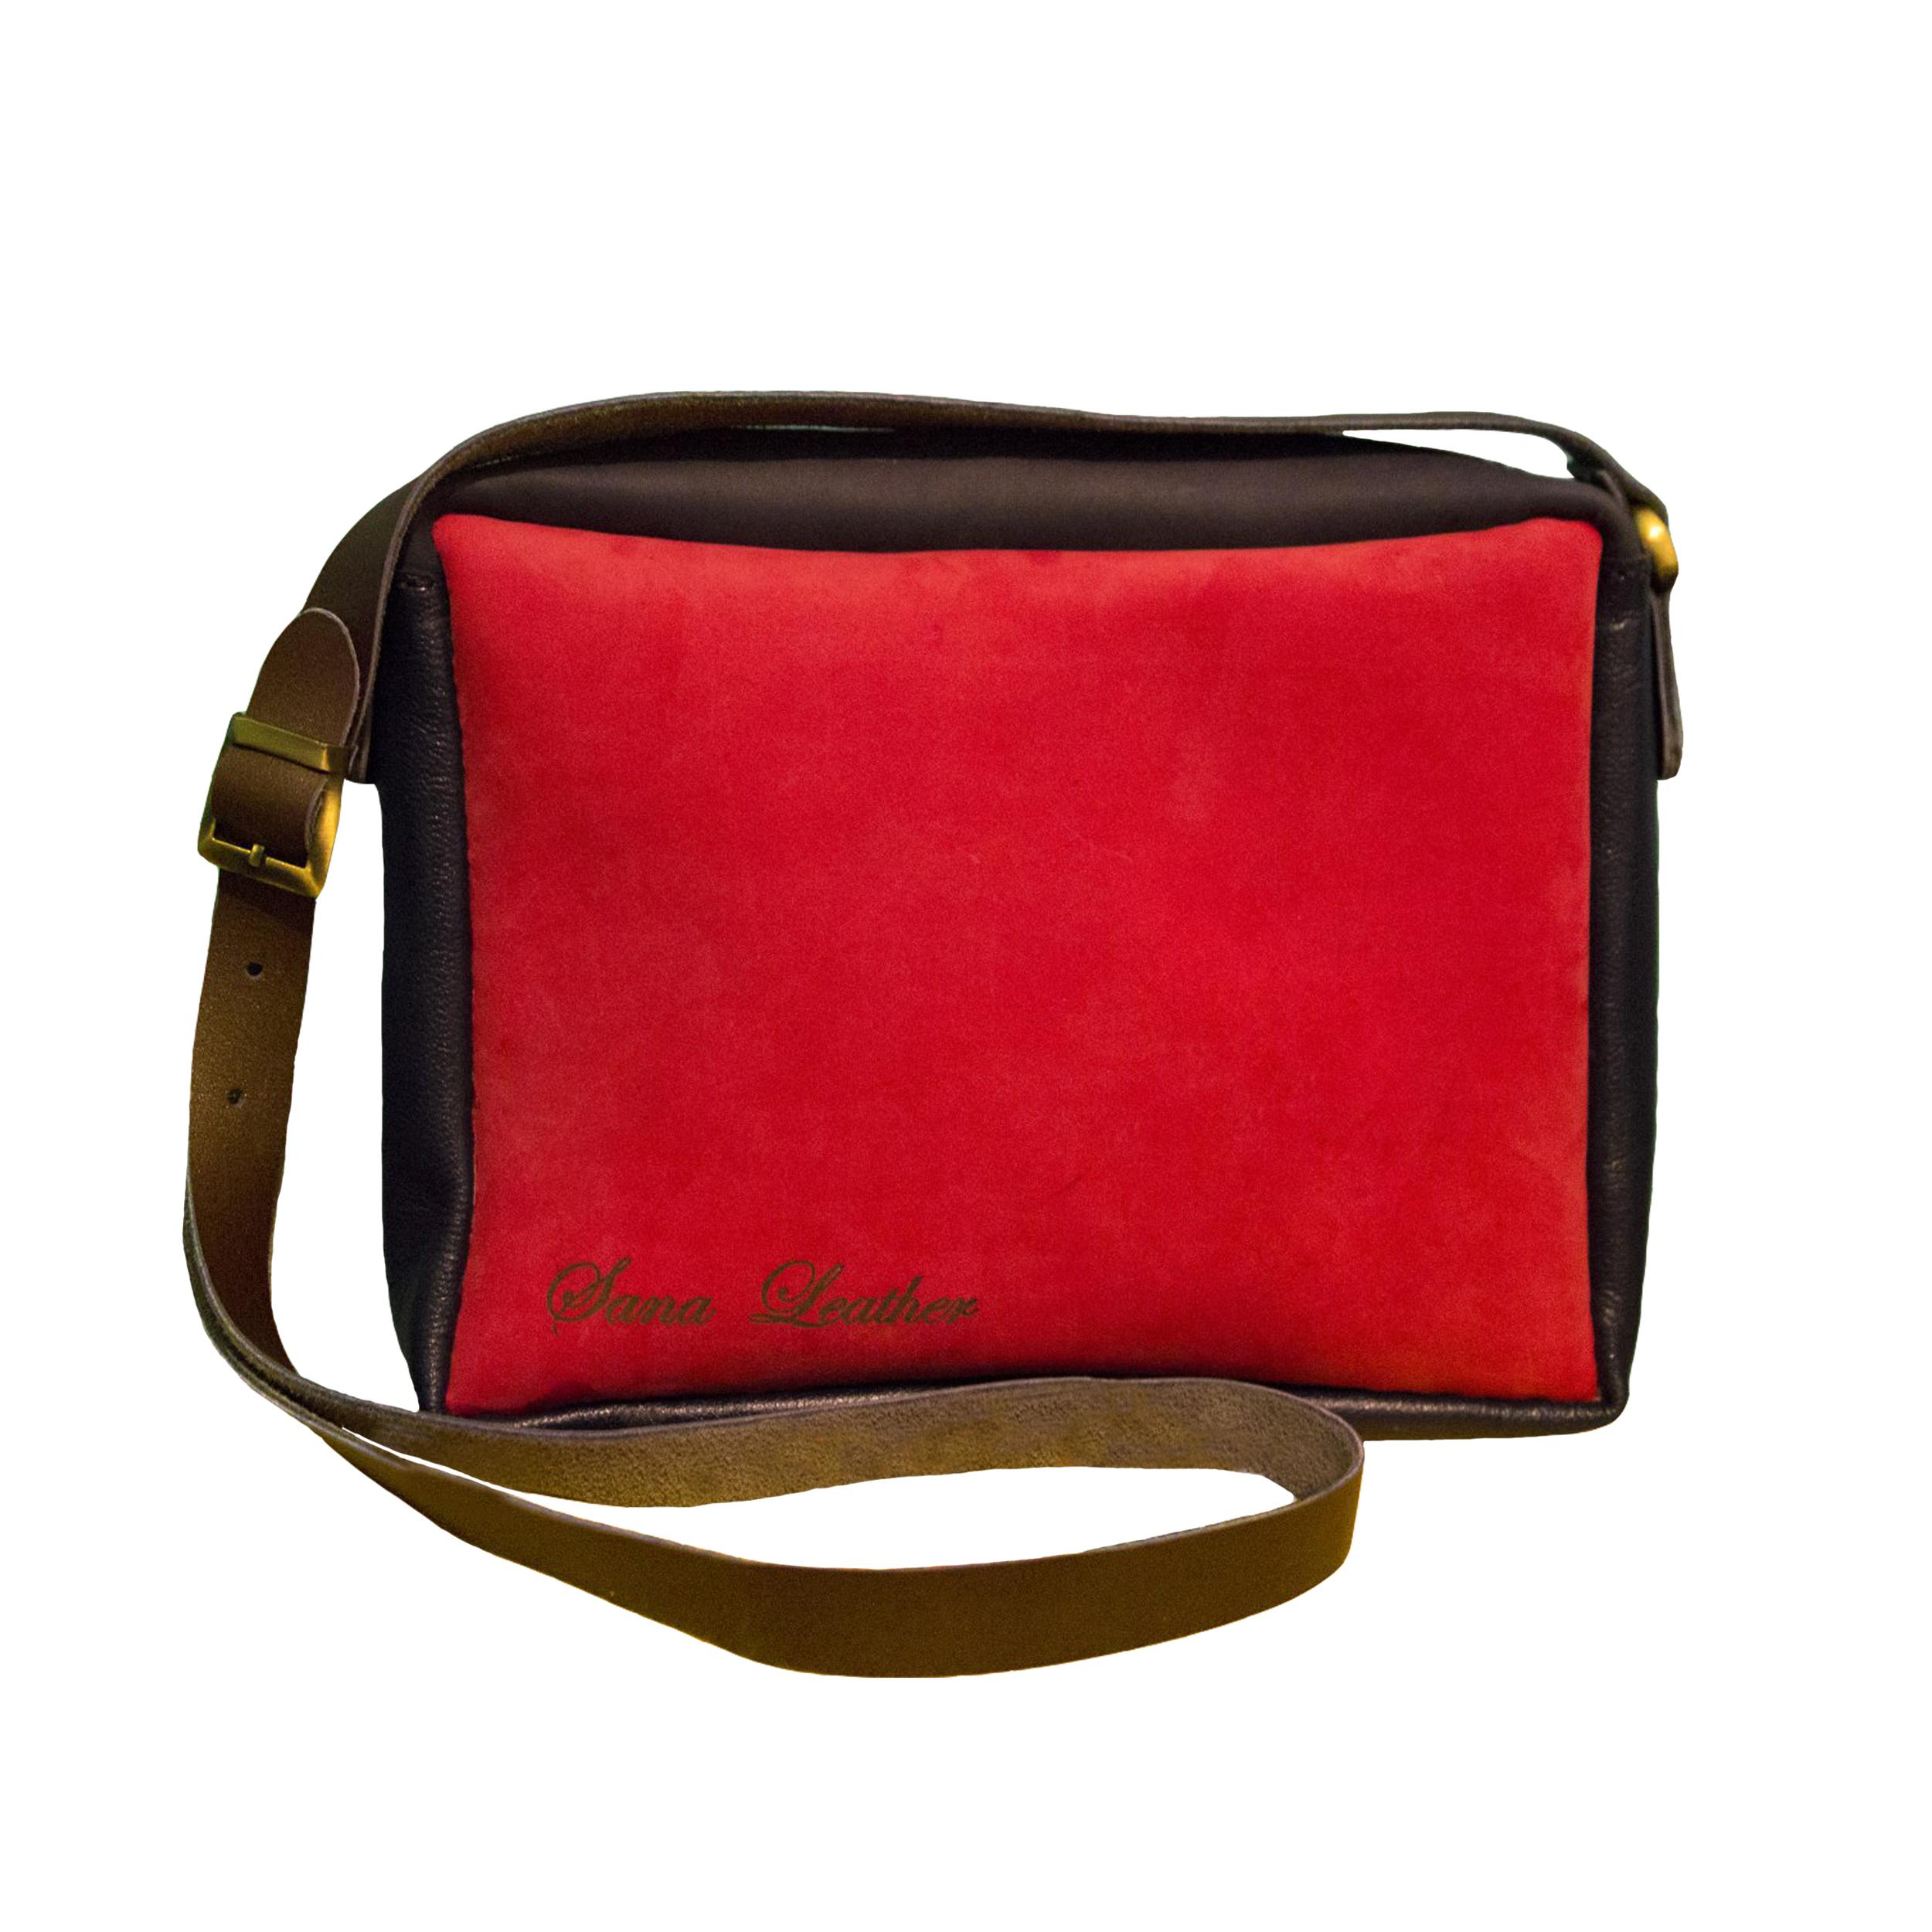 کیف چرمی کد 142